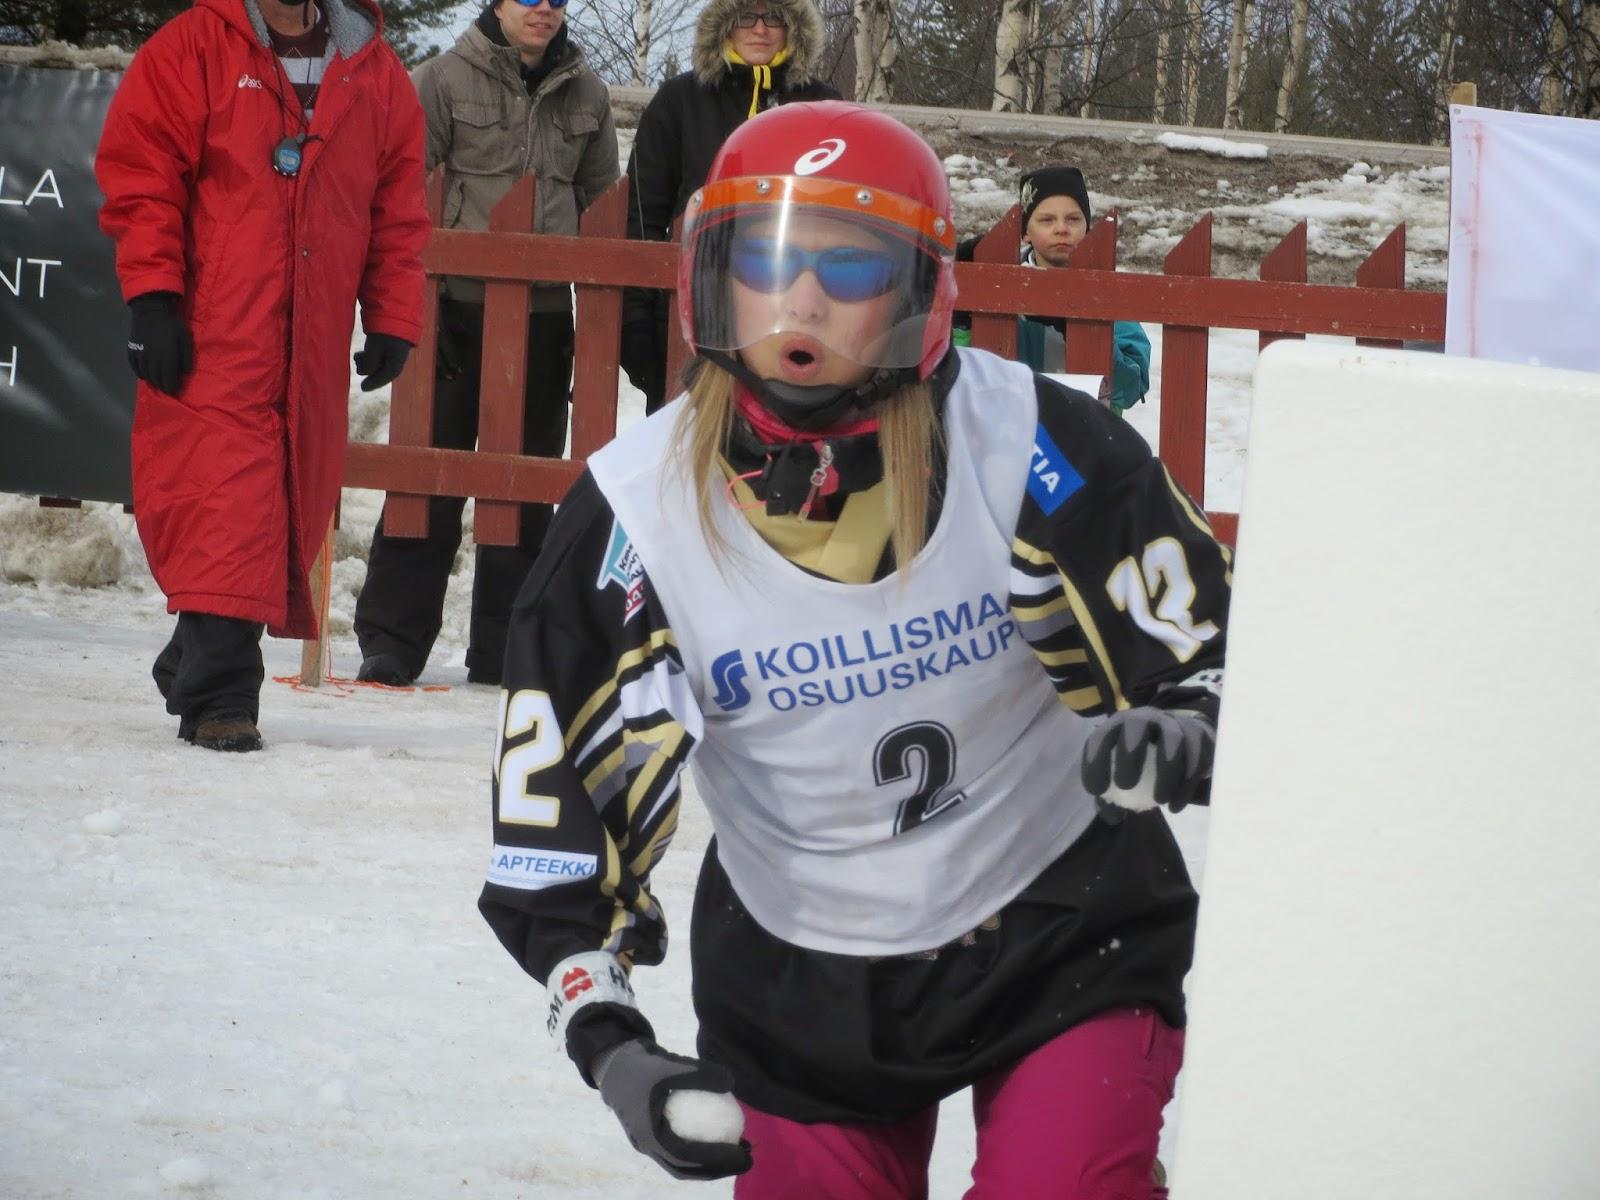 Tex Kemijärvi